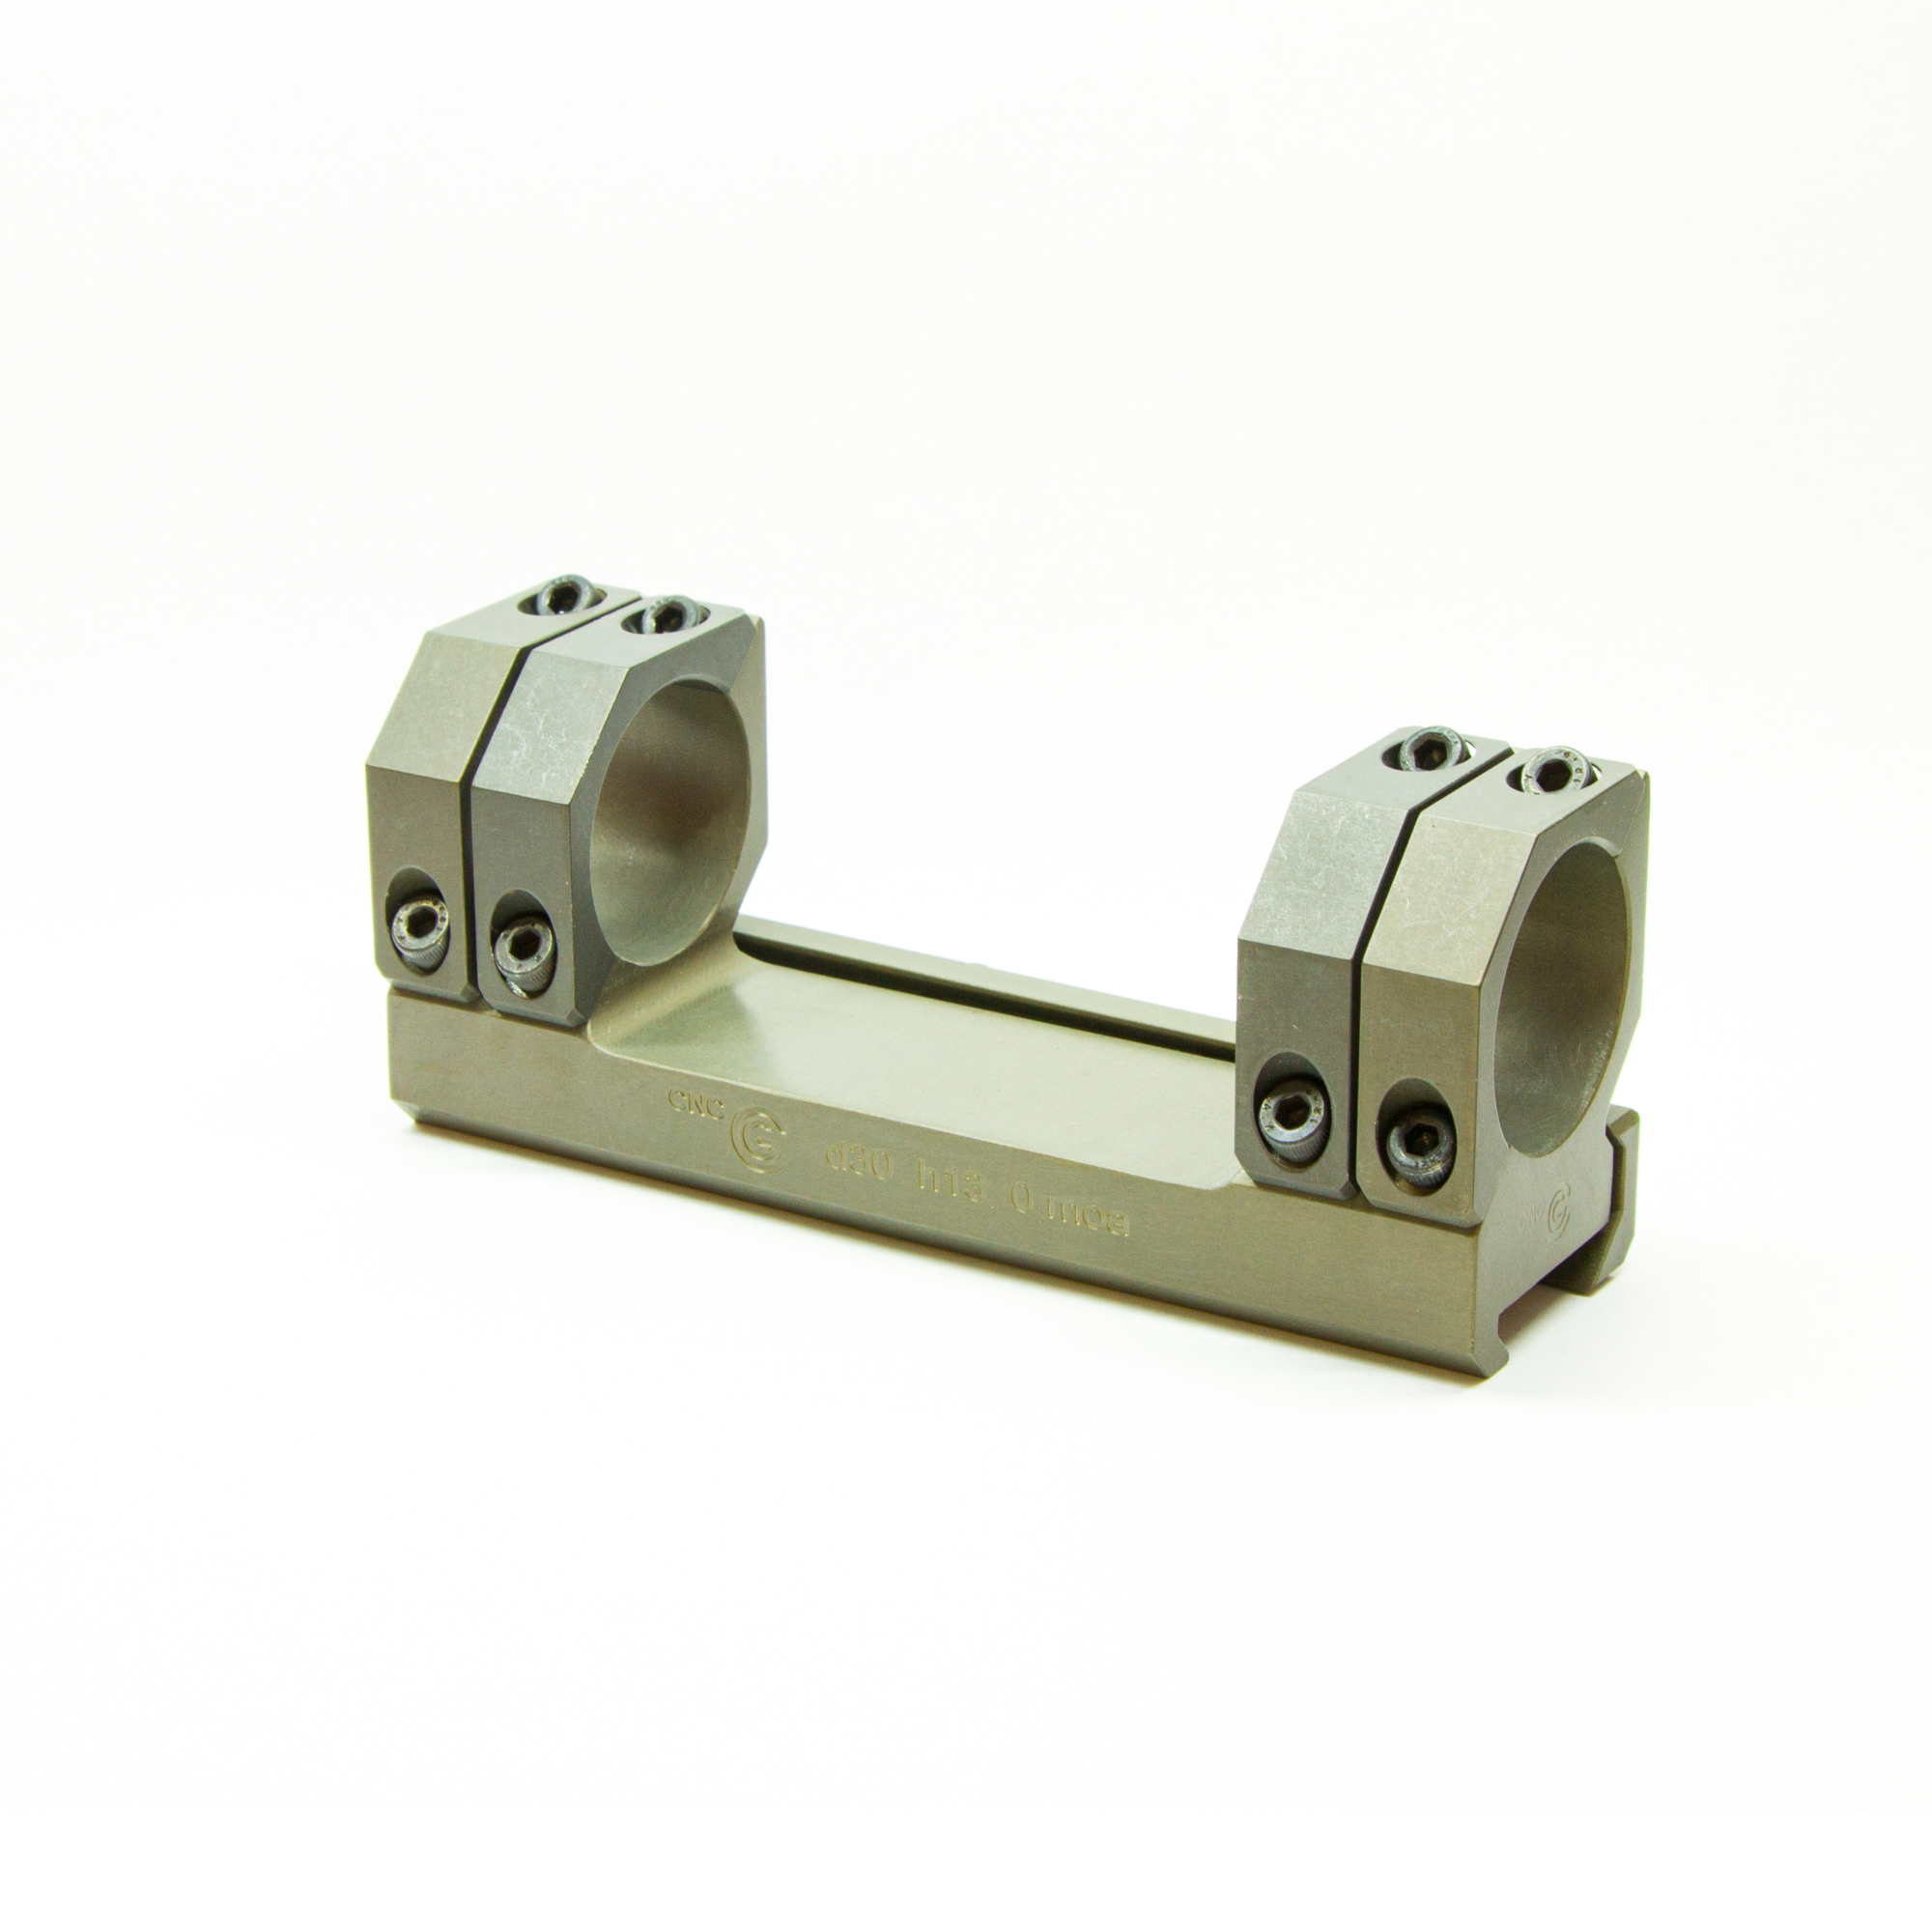 Кронштейн комбинированный D30 0 МОА